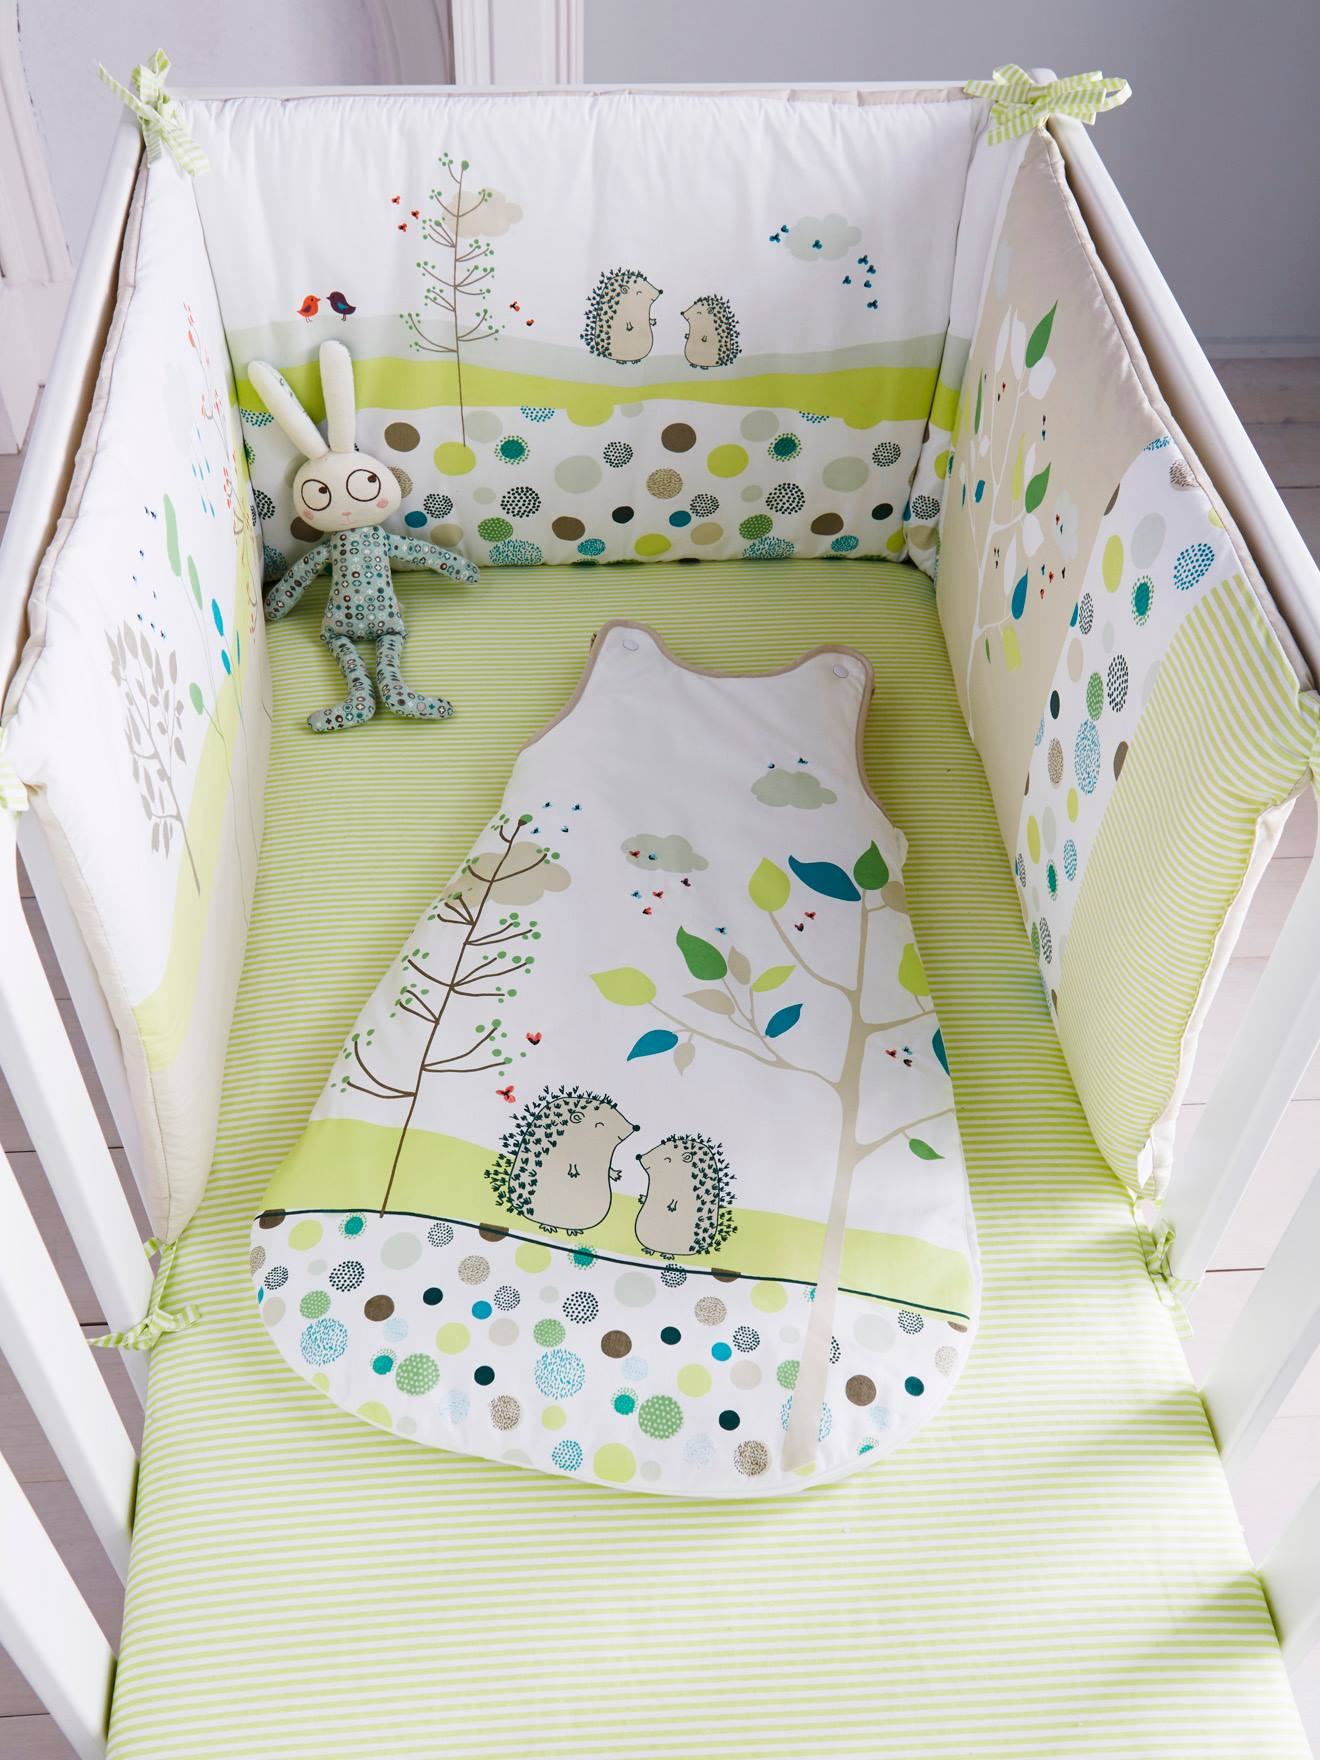 tour de lit pas cher fille cool crations lit bebe fille sur a little market lit bebe fille. Black Bedroom Furniture Sets. Home Design Ideas